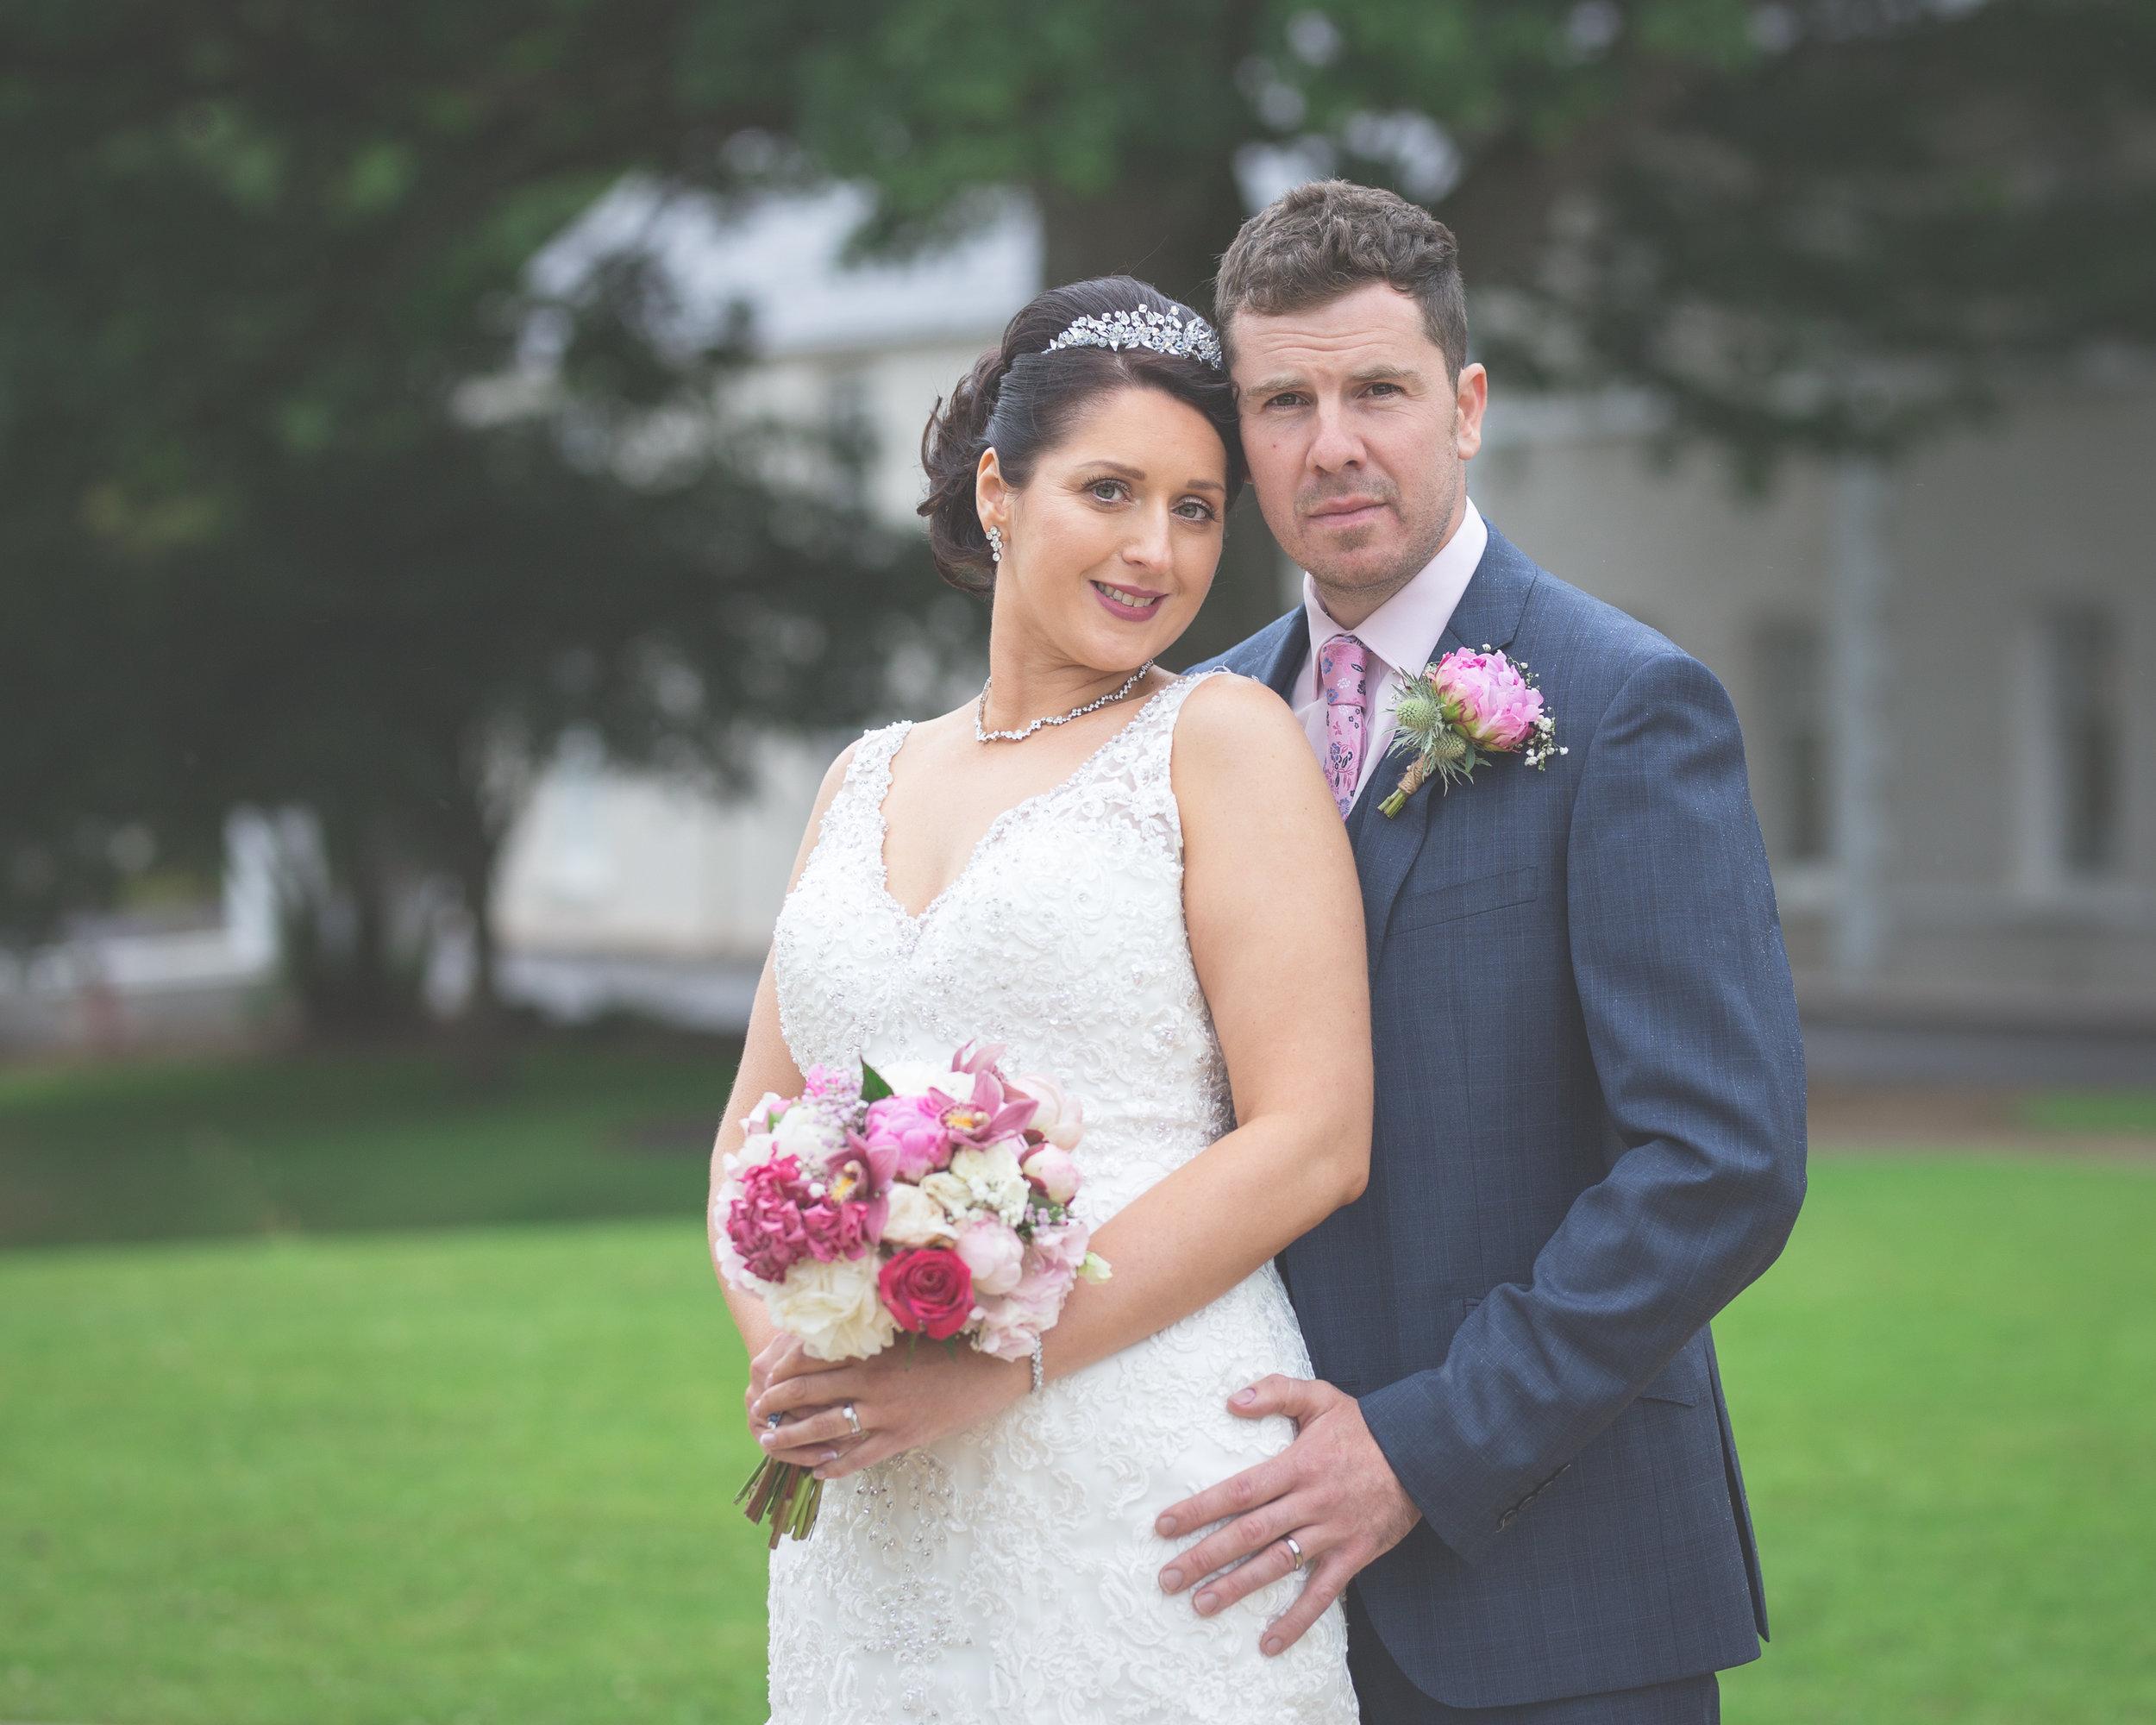 Northern Ireland Wedding Photographer | Brian McEwan | Louise & Darren-295.jpg